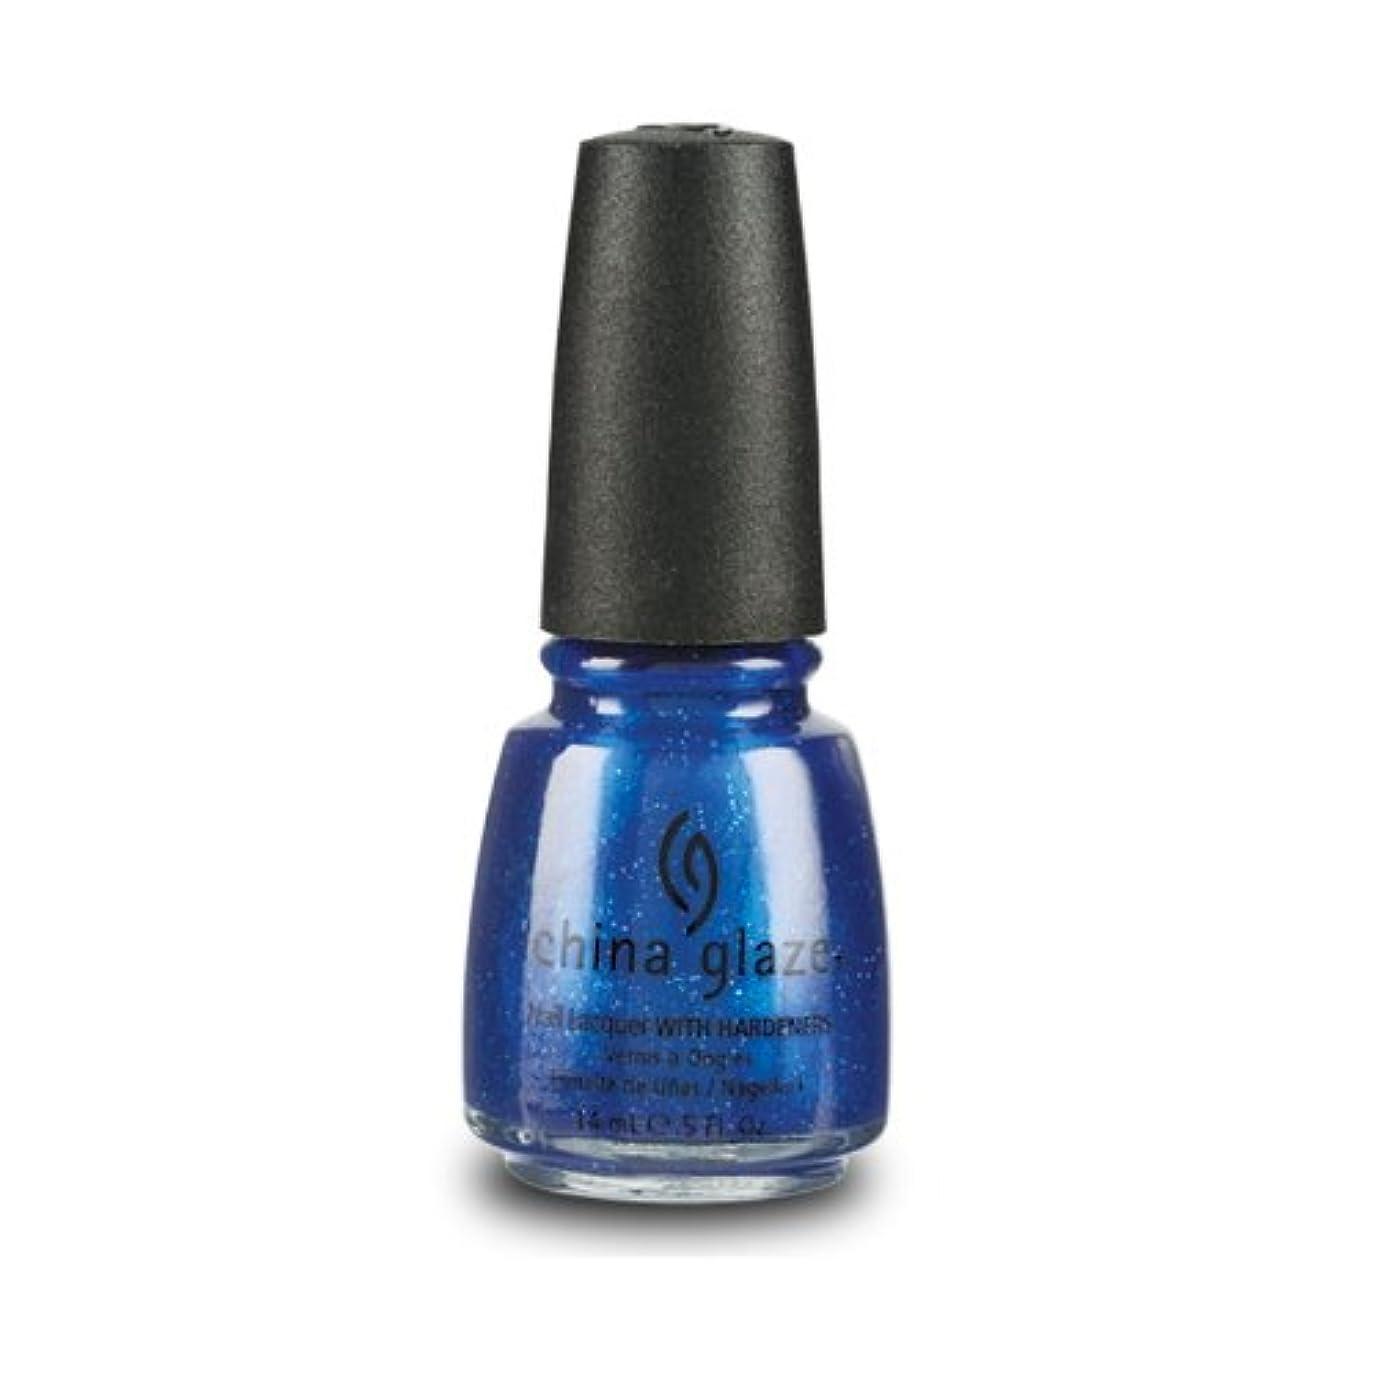 (6 Pack) CHINA GLAZE Nail Lacquer with Nail Hardner 2 - Dorothy Who? (並行輸入品)